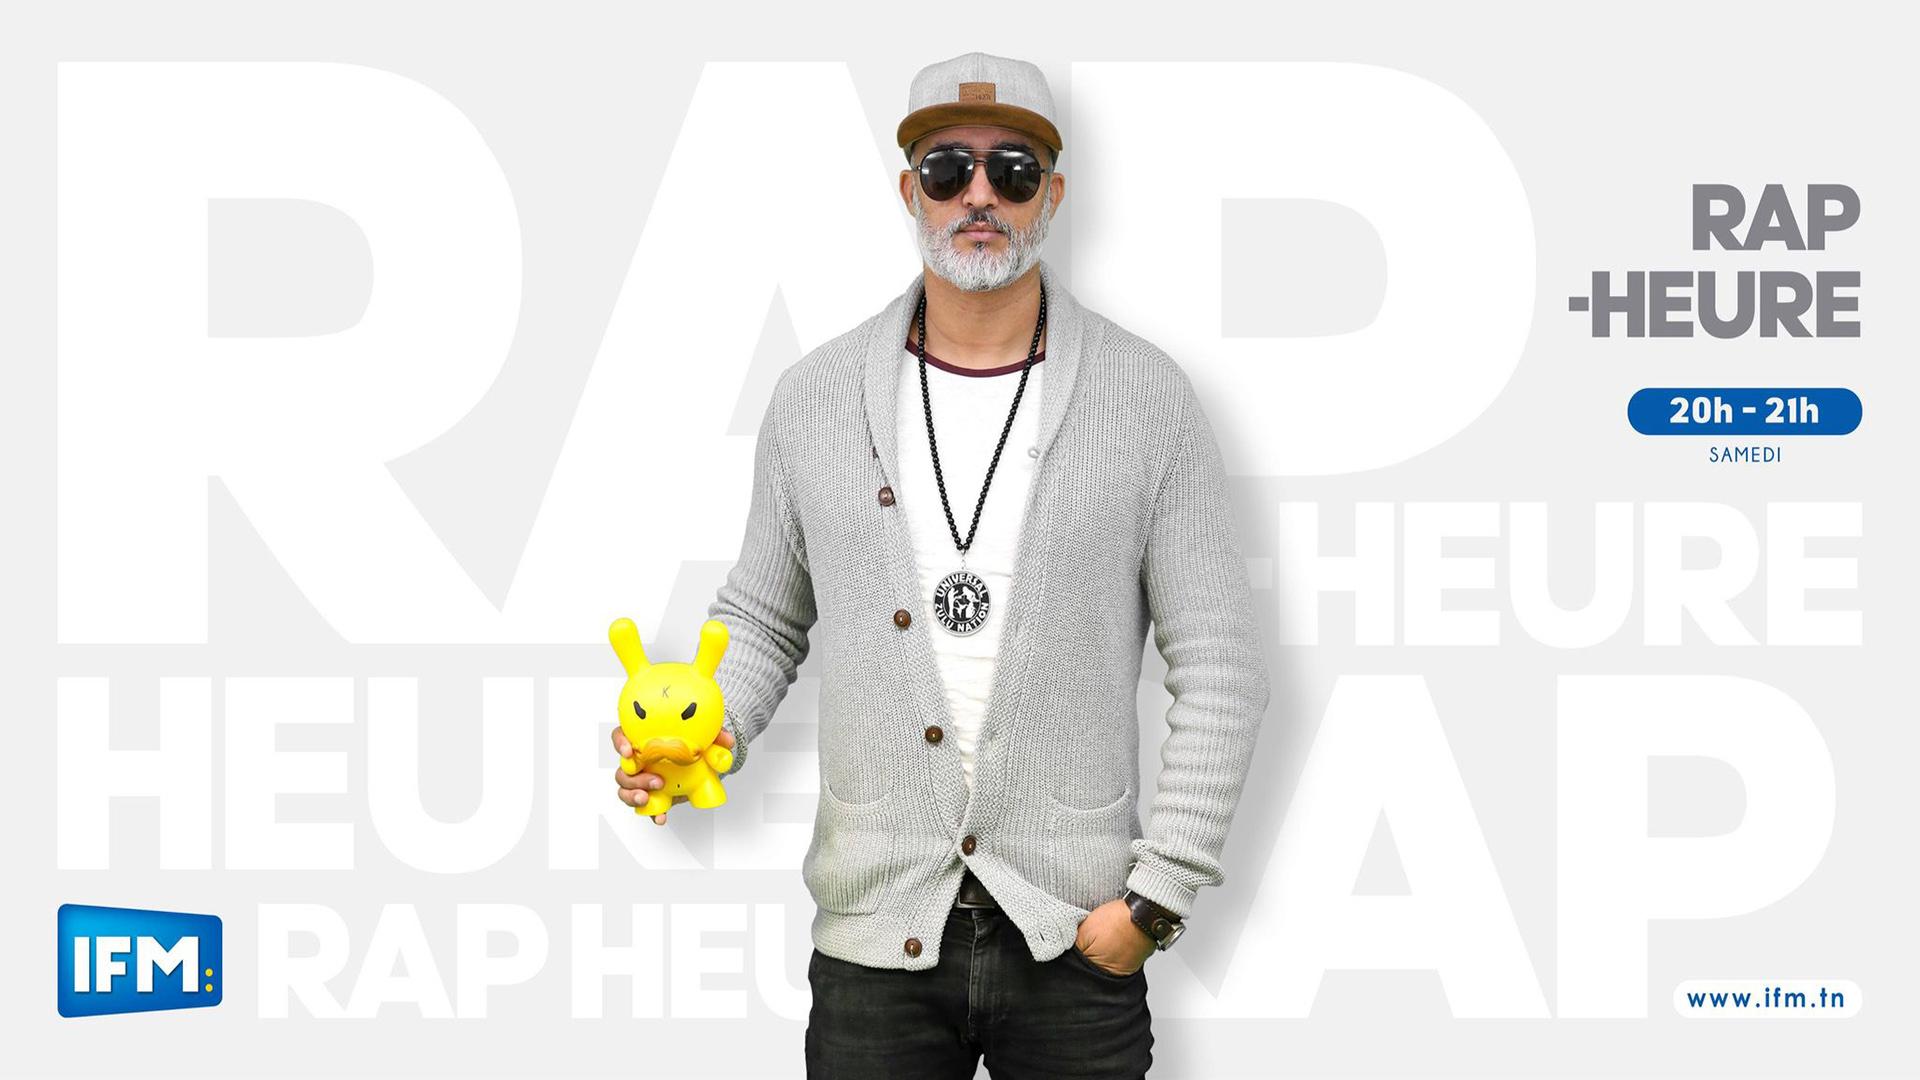 Rap Heure Rap Heure S2 : Ta9chira